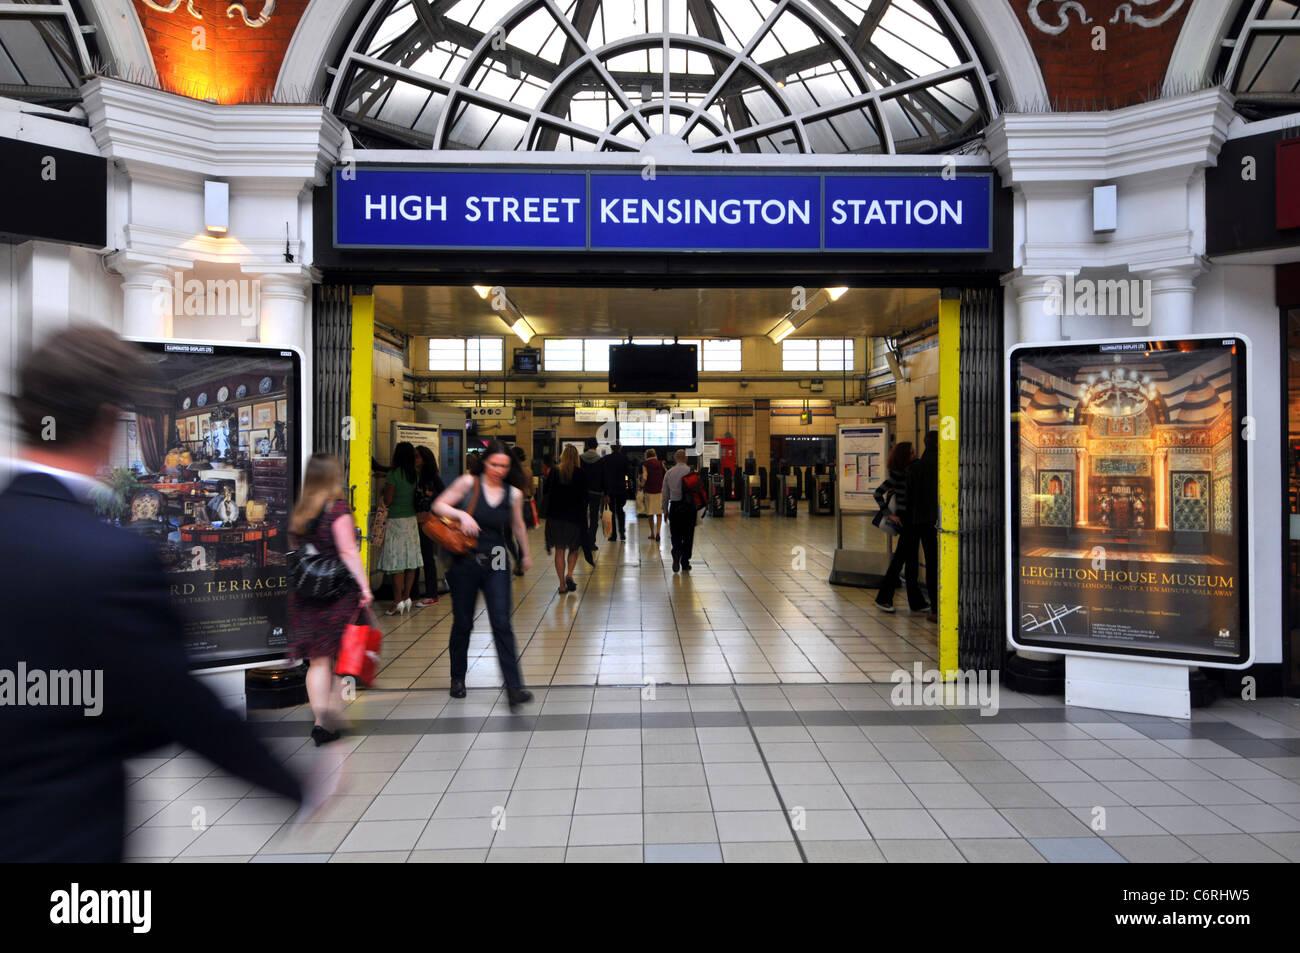 High Street Kensington Station, London, Britain, UK - Stock Image